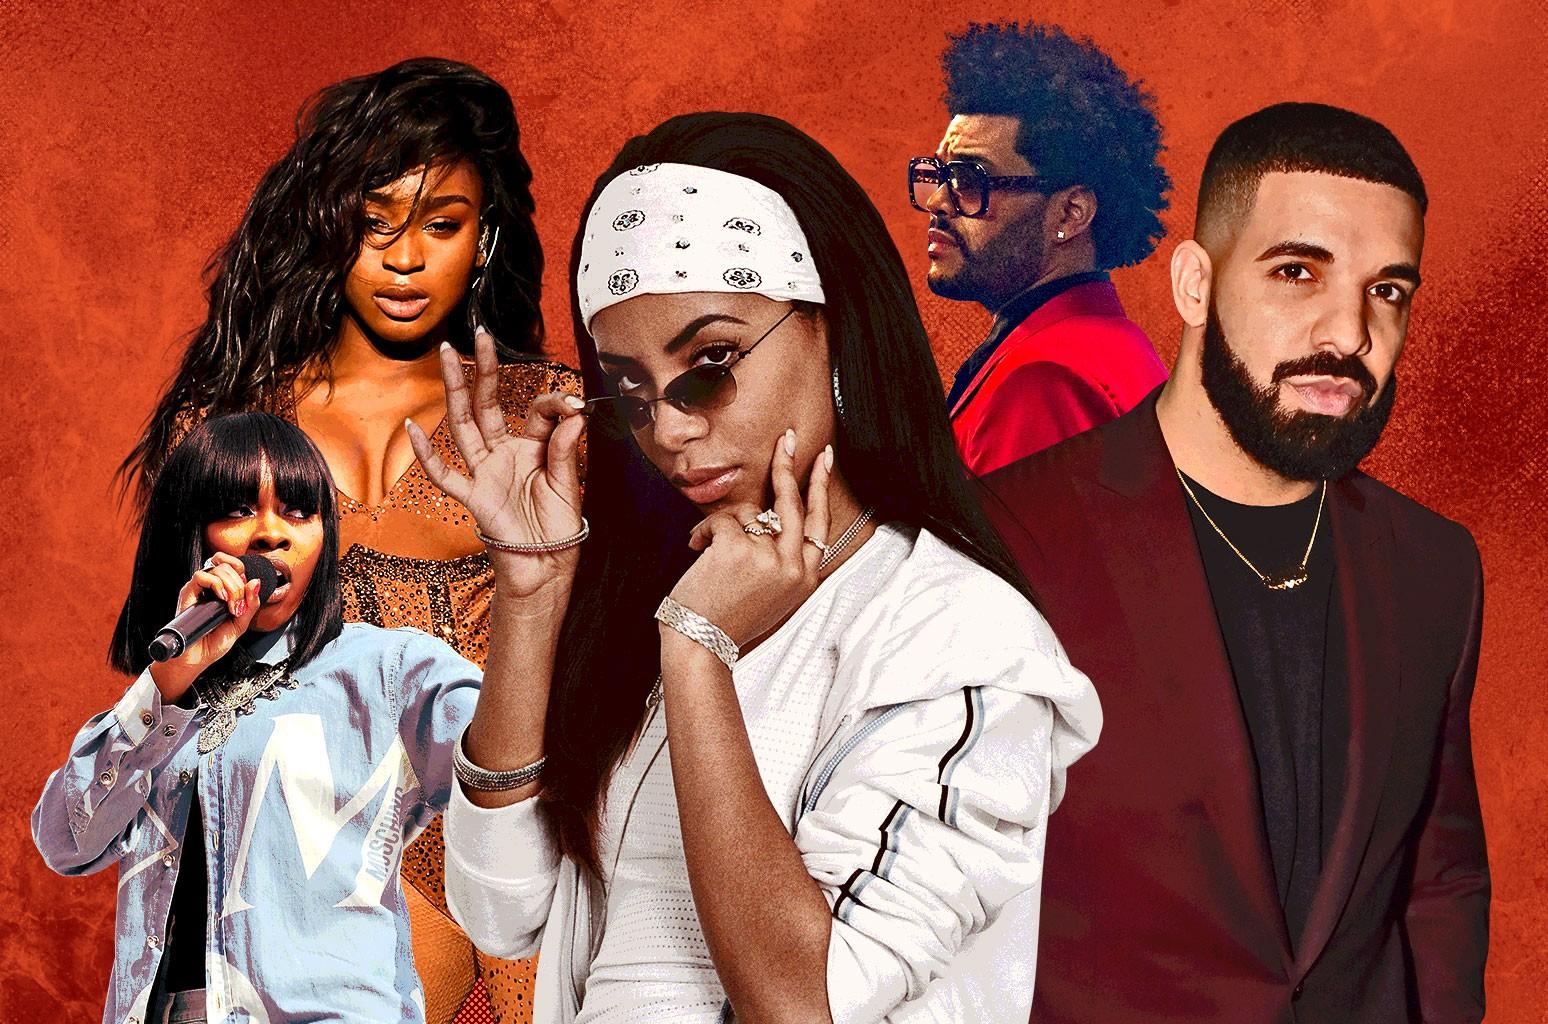 Tink, Normani, Aaliyah, The Weeknd, Drake